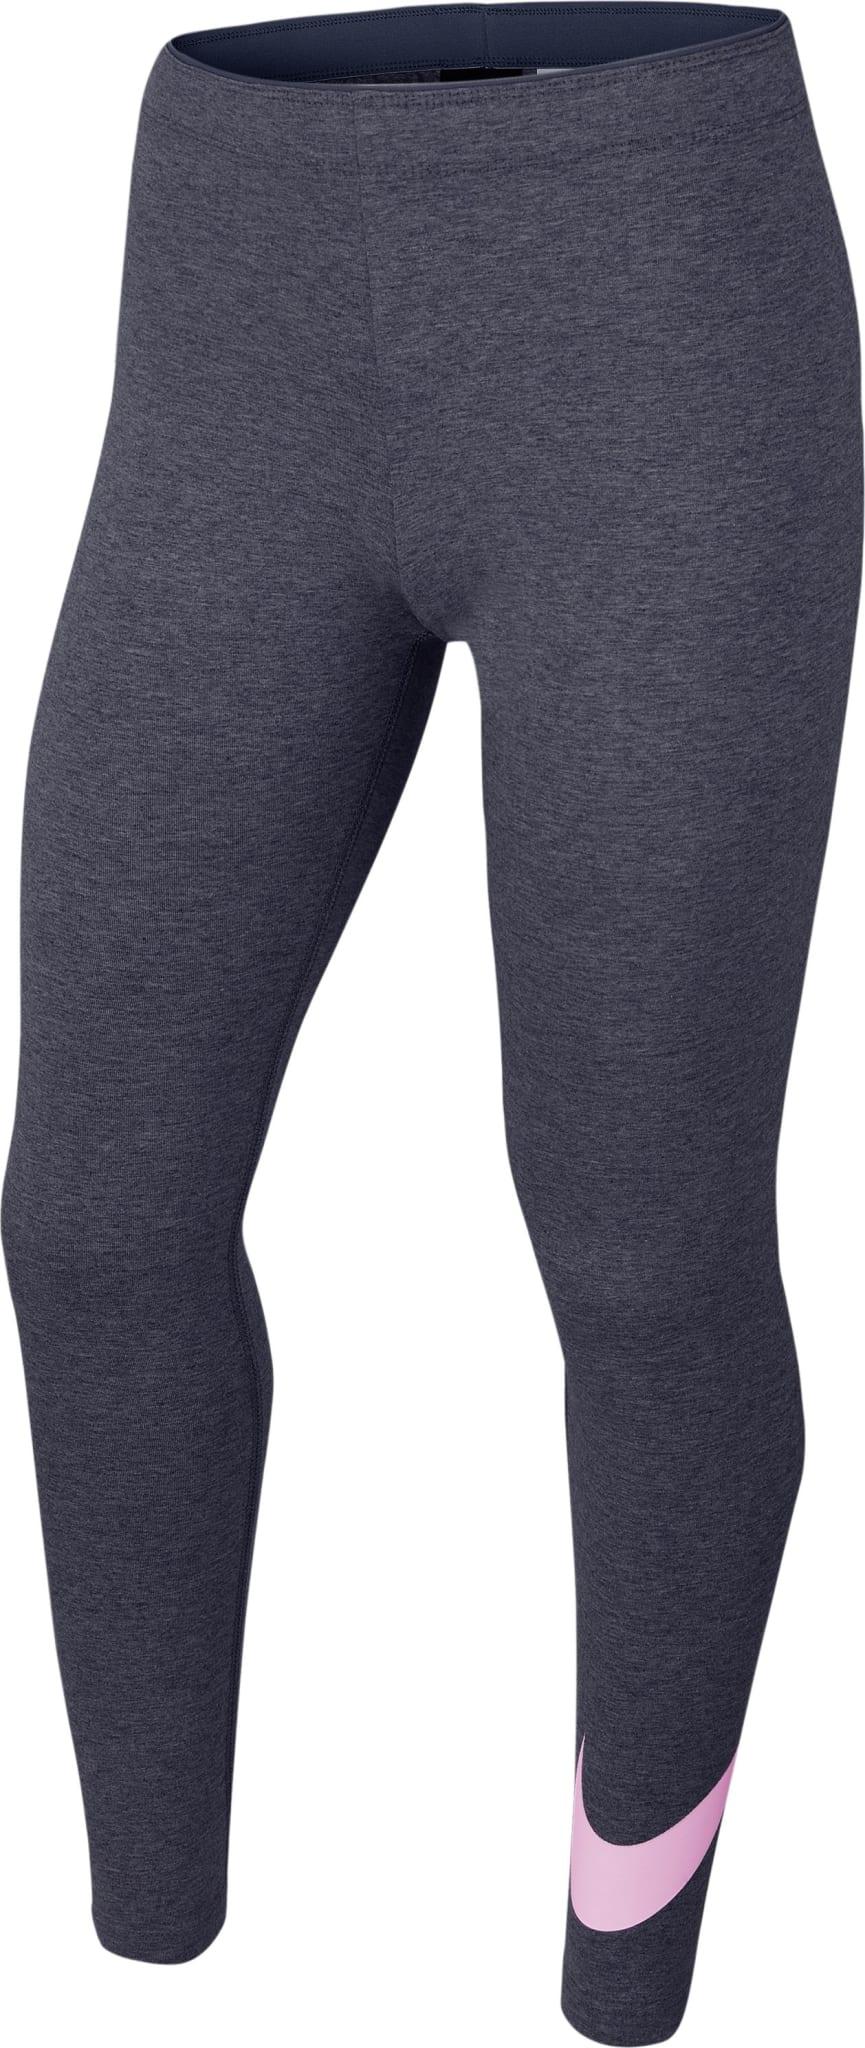 Sportswear Girls' Tights